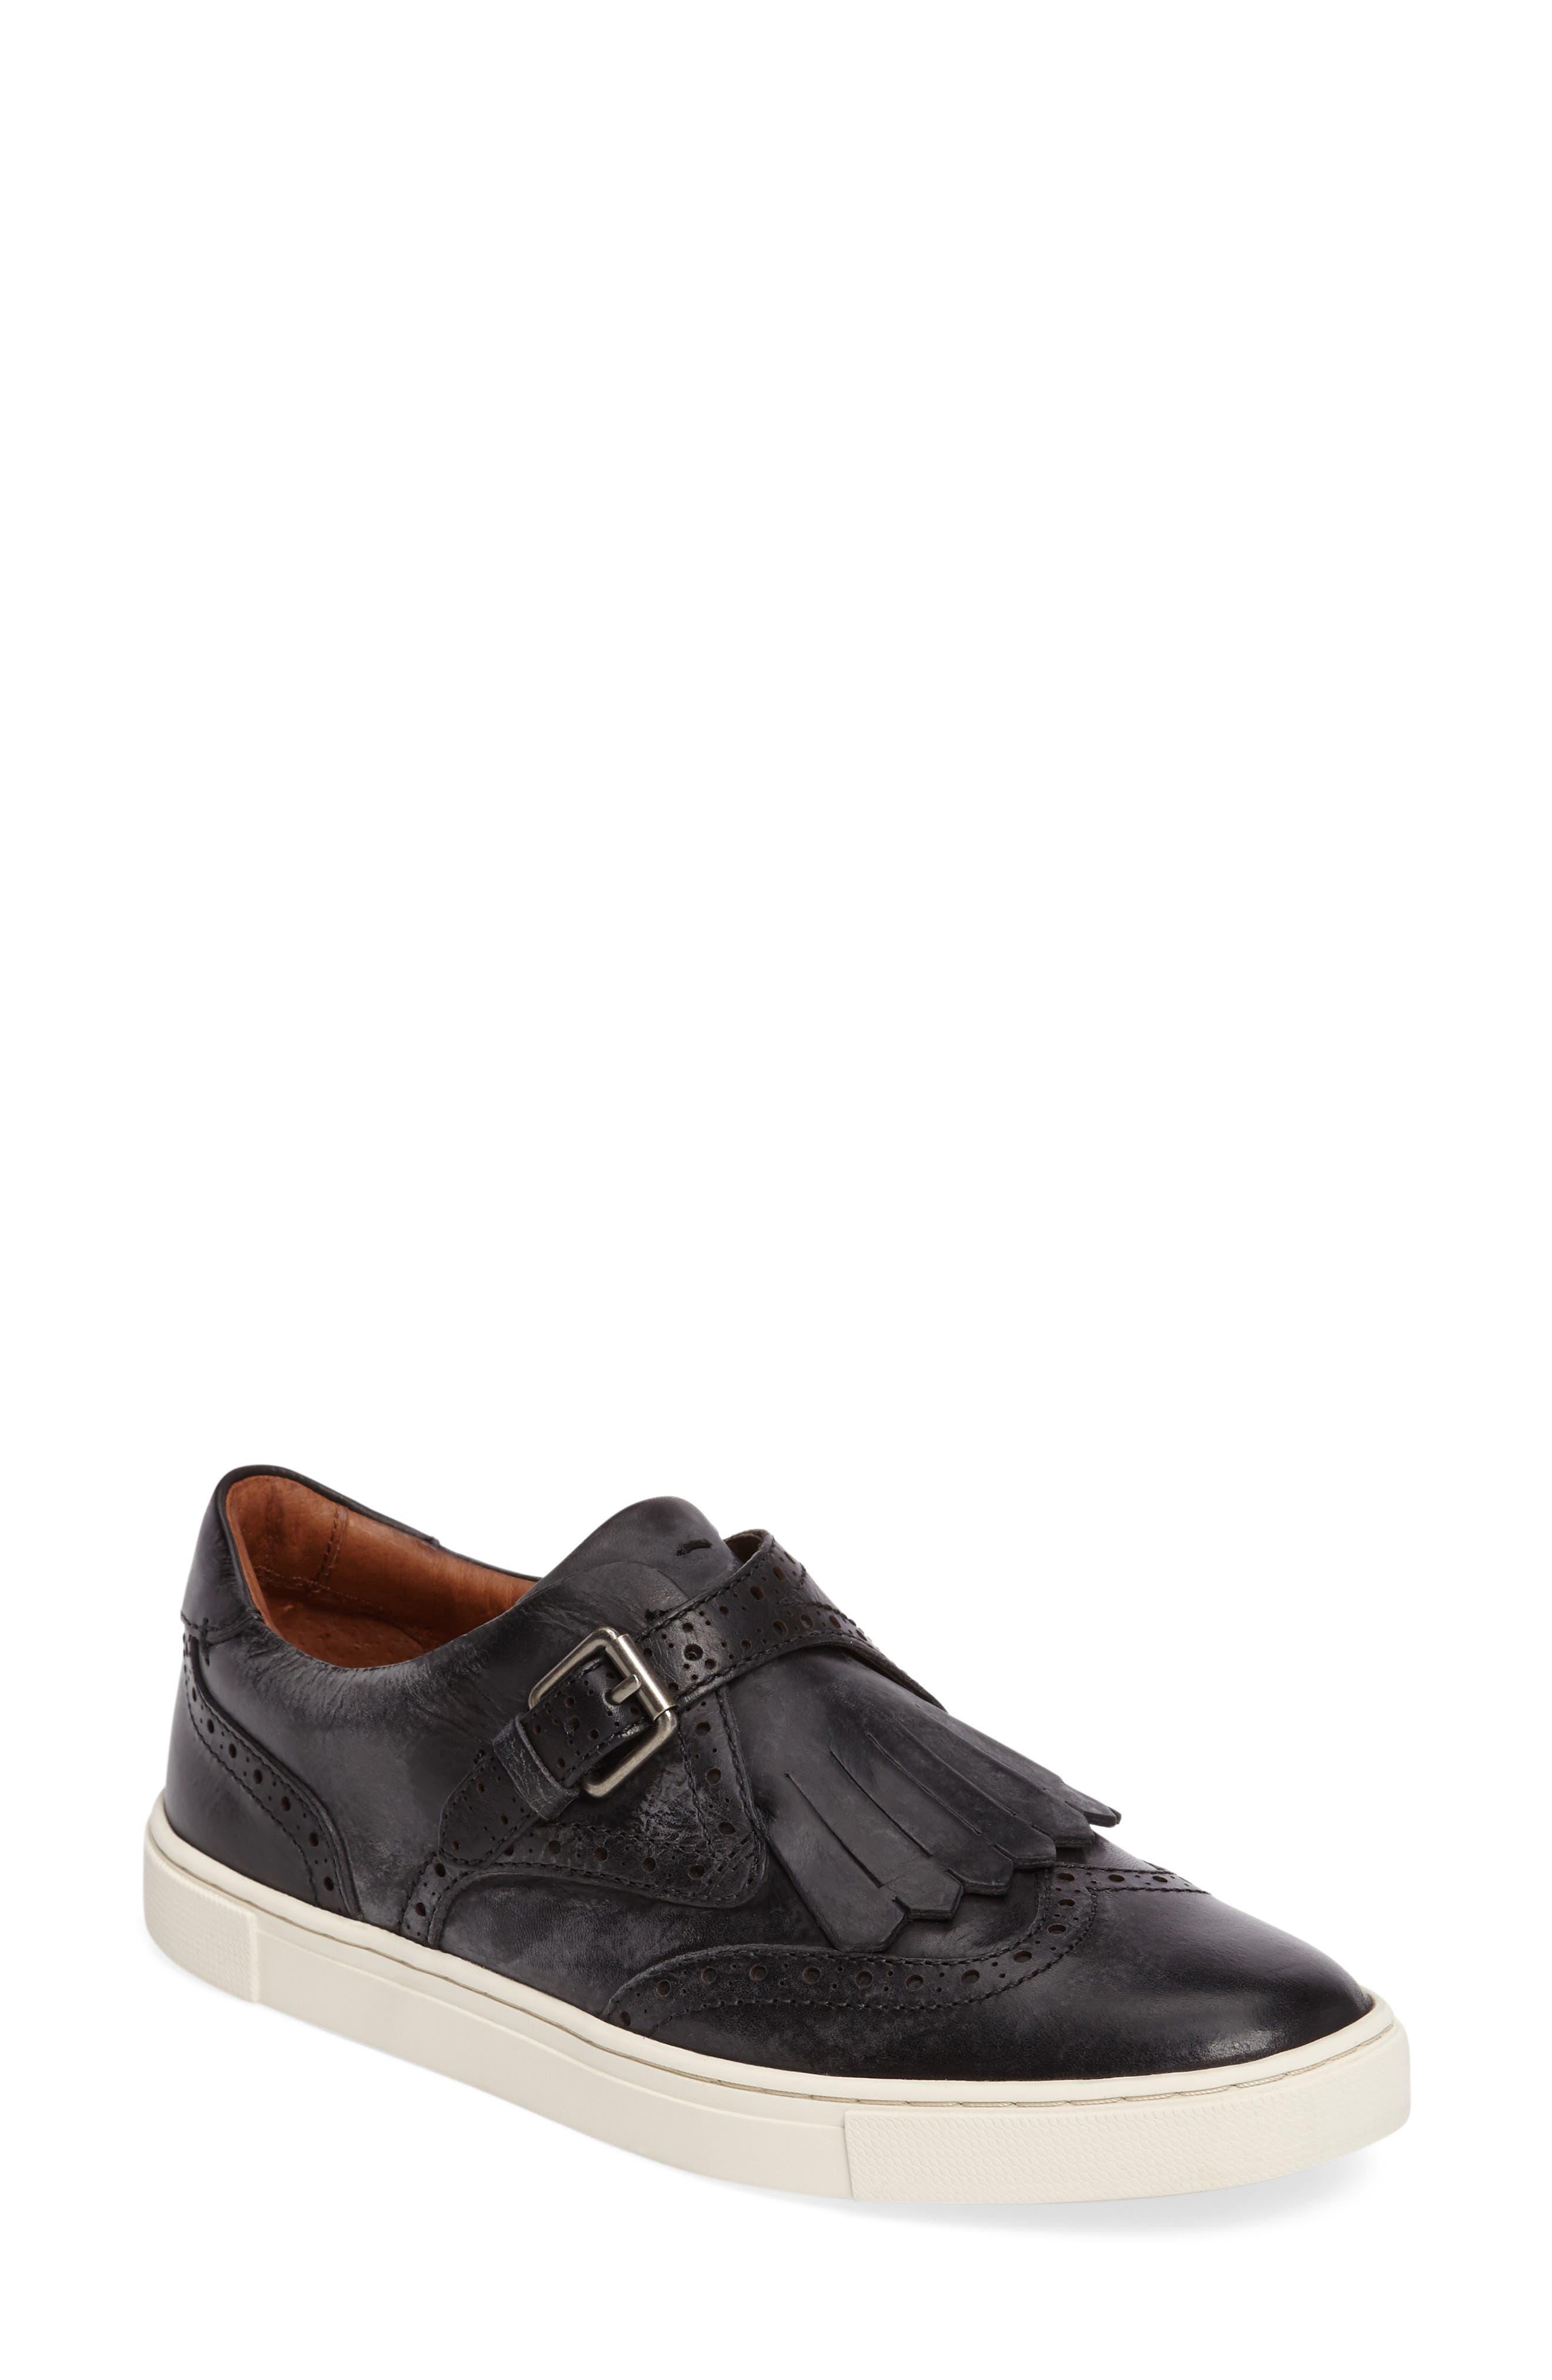 'Gemma' Kiltie Slip On-Sneaker,                         Main,                         color, 001